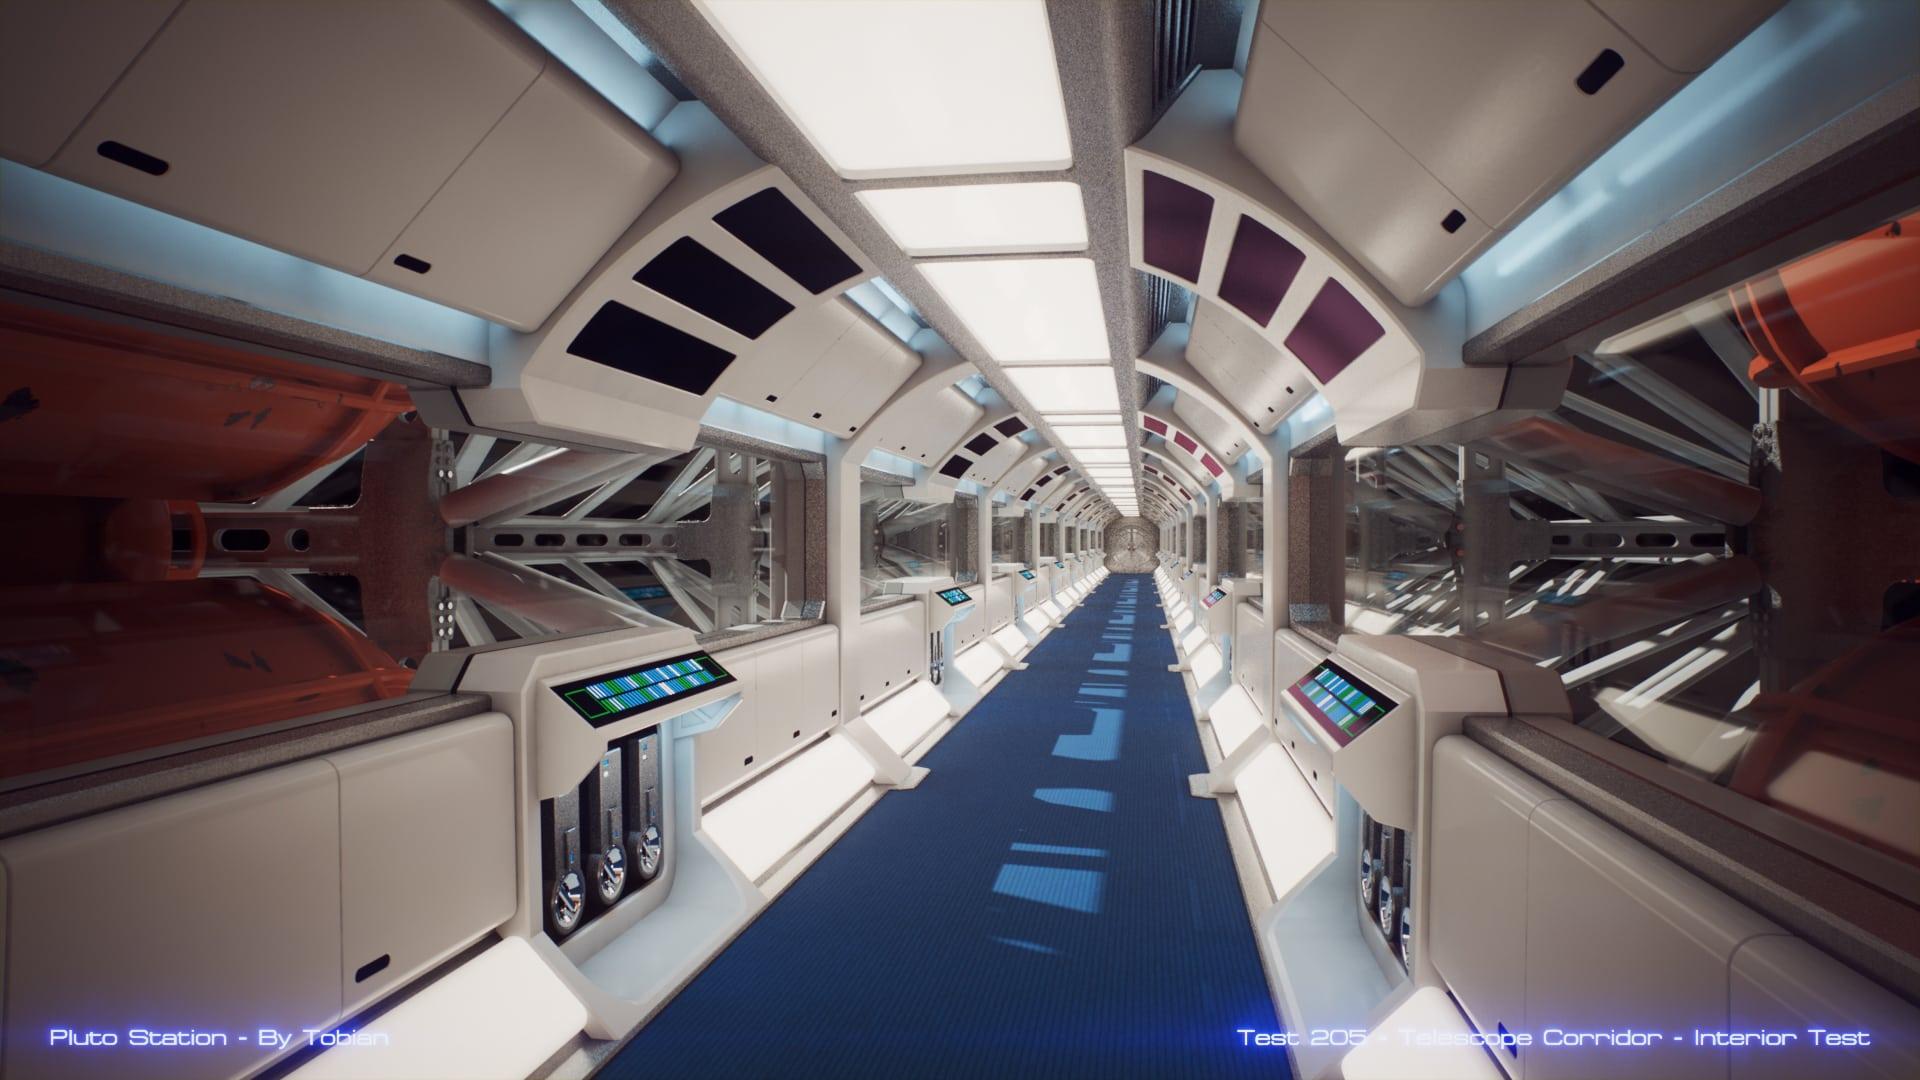 Finally a new test. The Telescope Corridor.